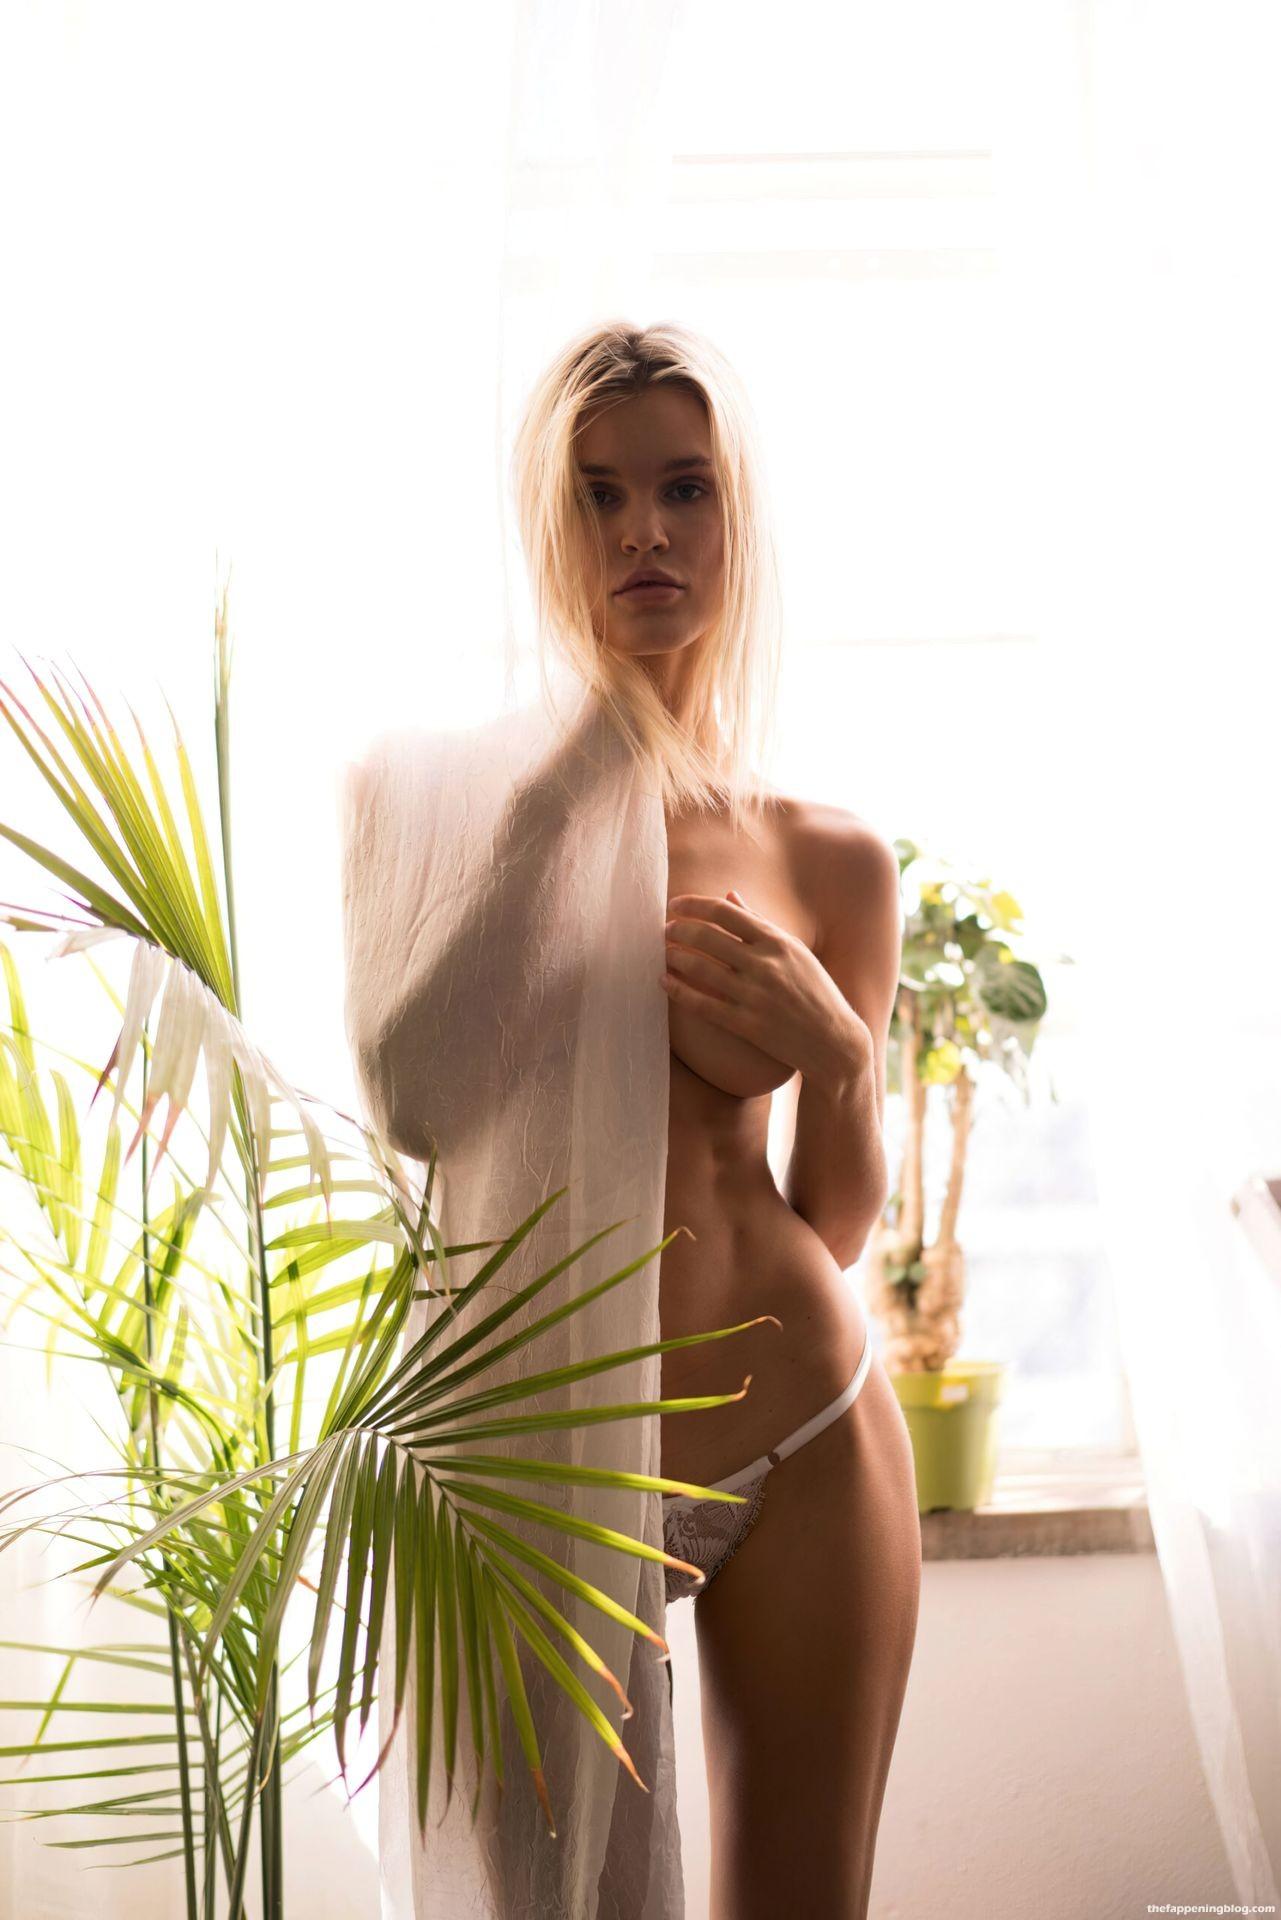 Joy-Corrigan-Naked-Tits-and-Ass-10-scaled1-thefappeningblog.com_.jpg